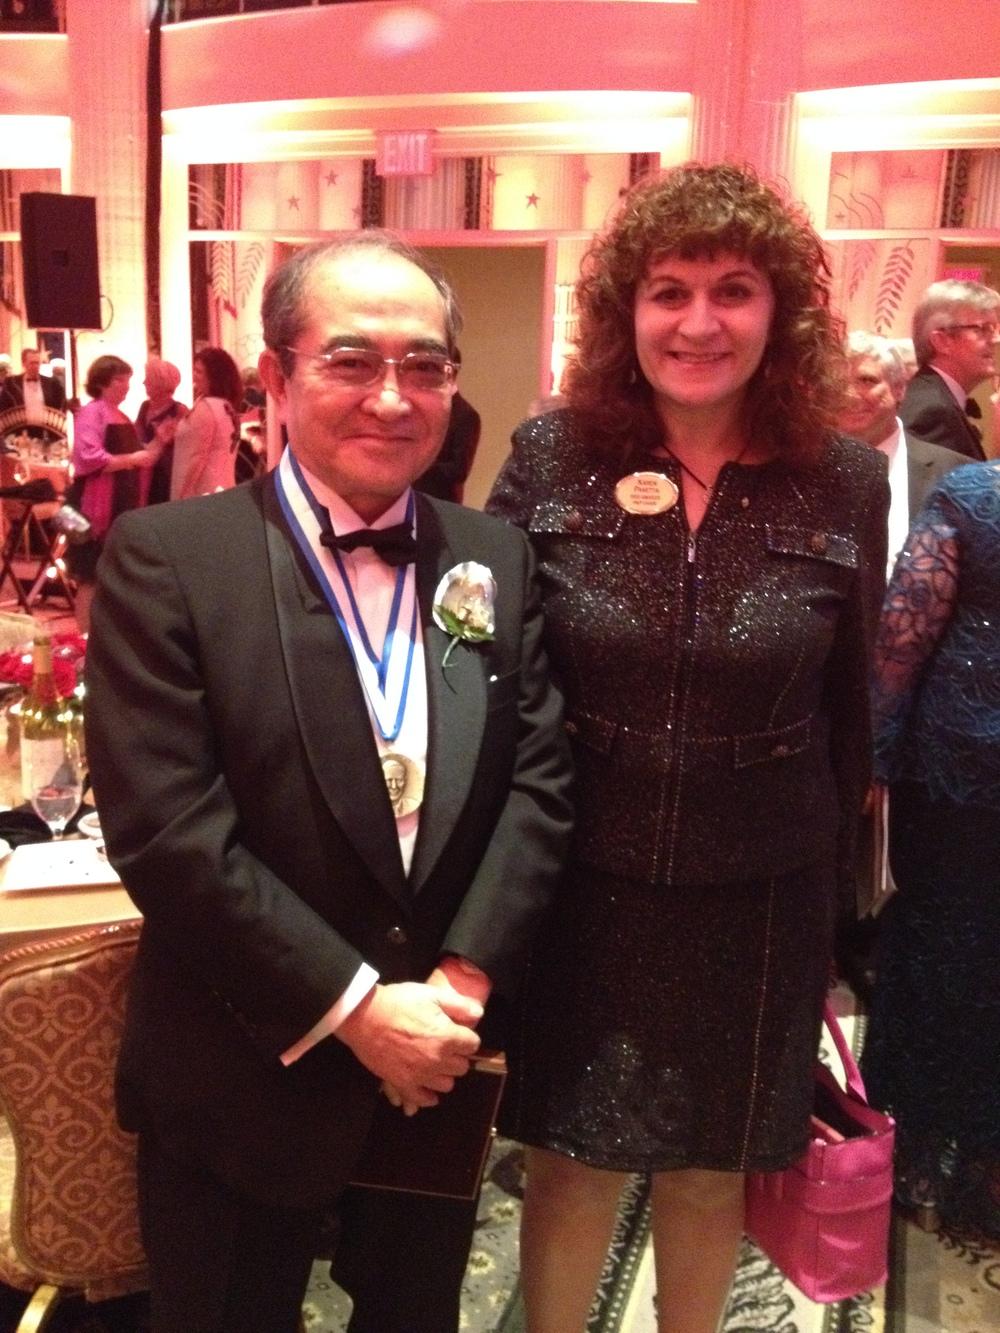 IEEE Haraden Pratt Award recipient Fumio Harashima